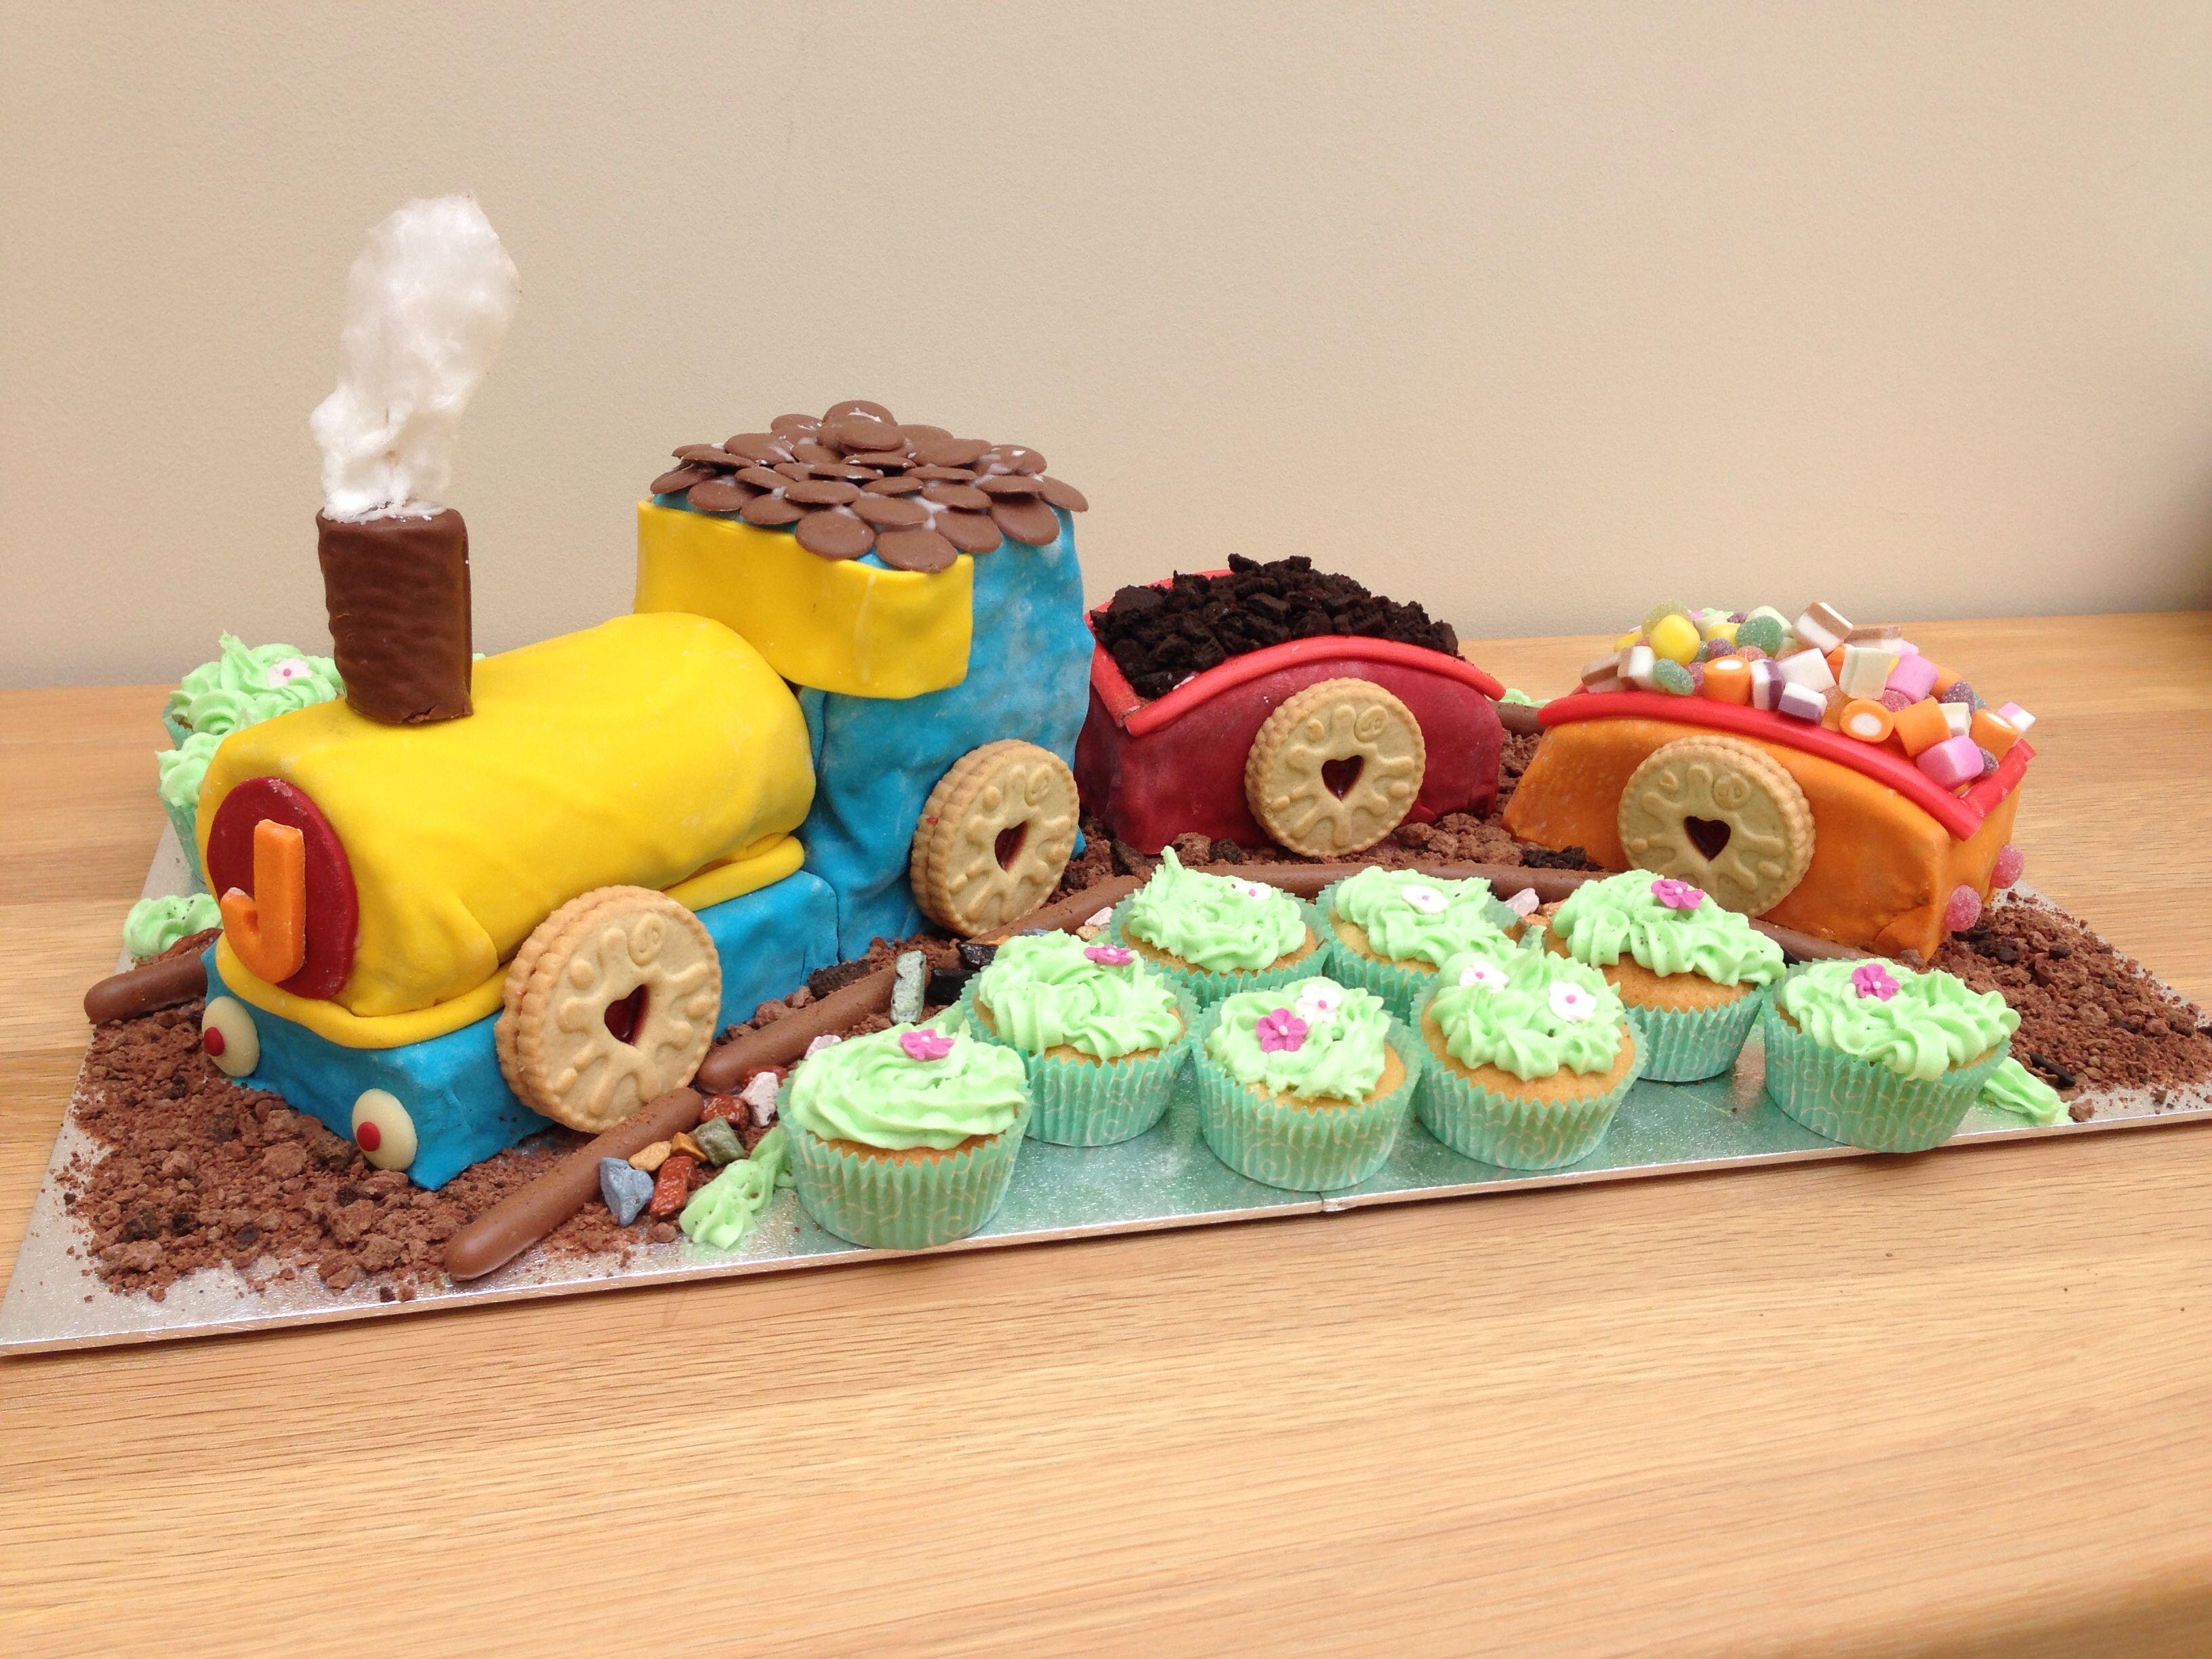 Train Cake No Tutorial Chocolate Cake And Swiss Roll